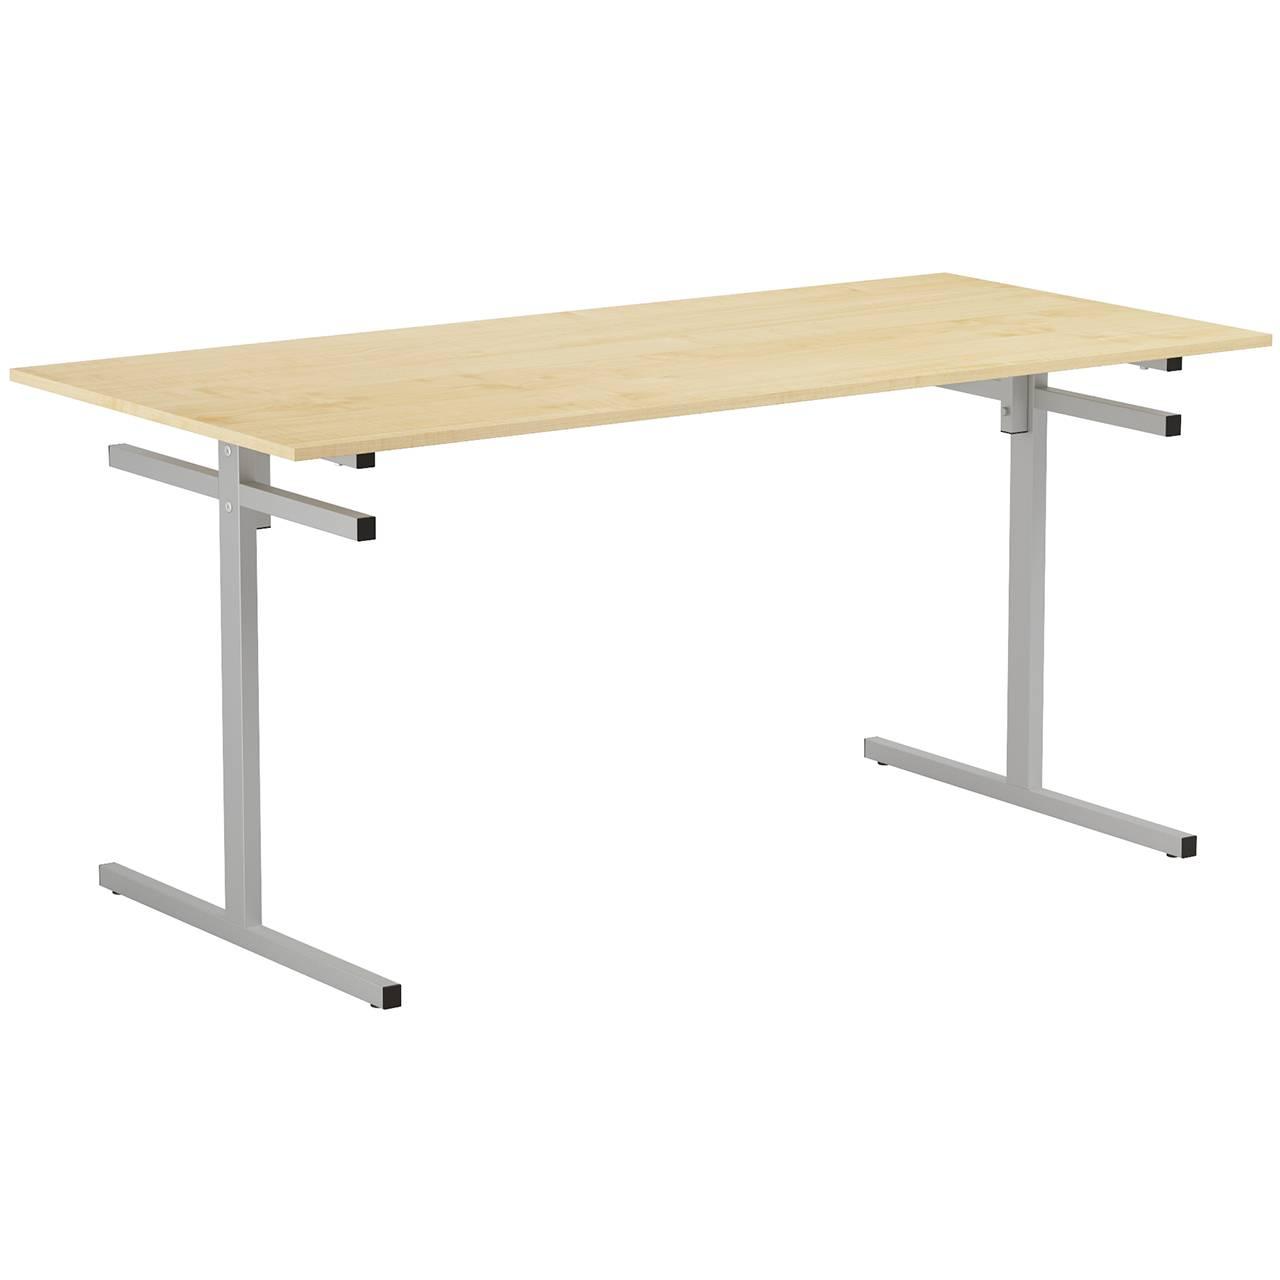 Стол для столовой 6-местный для скамеек (гр. 5,6) серый Клен 6 Пластик